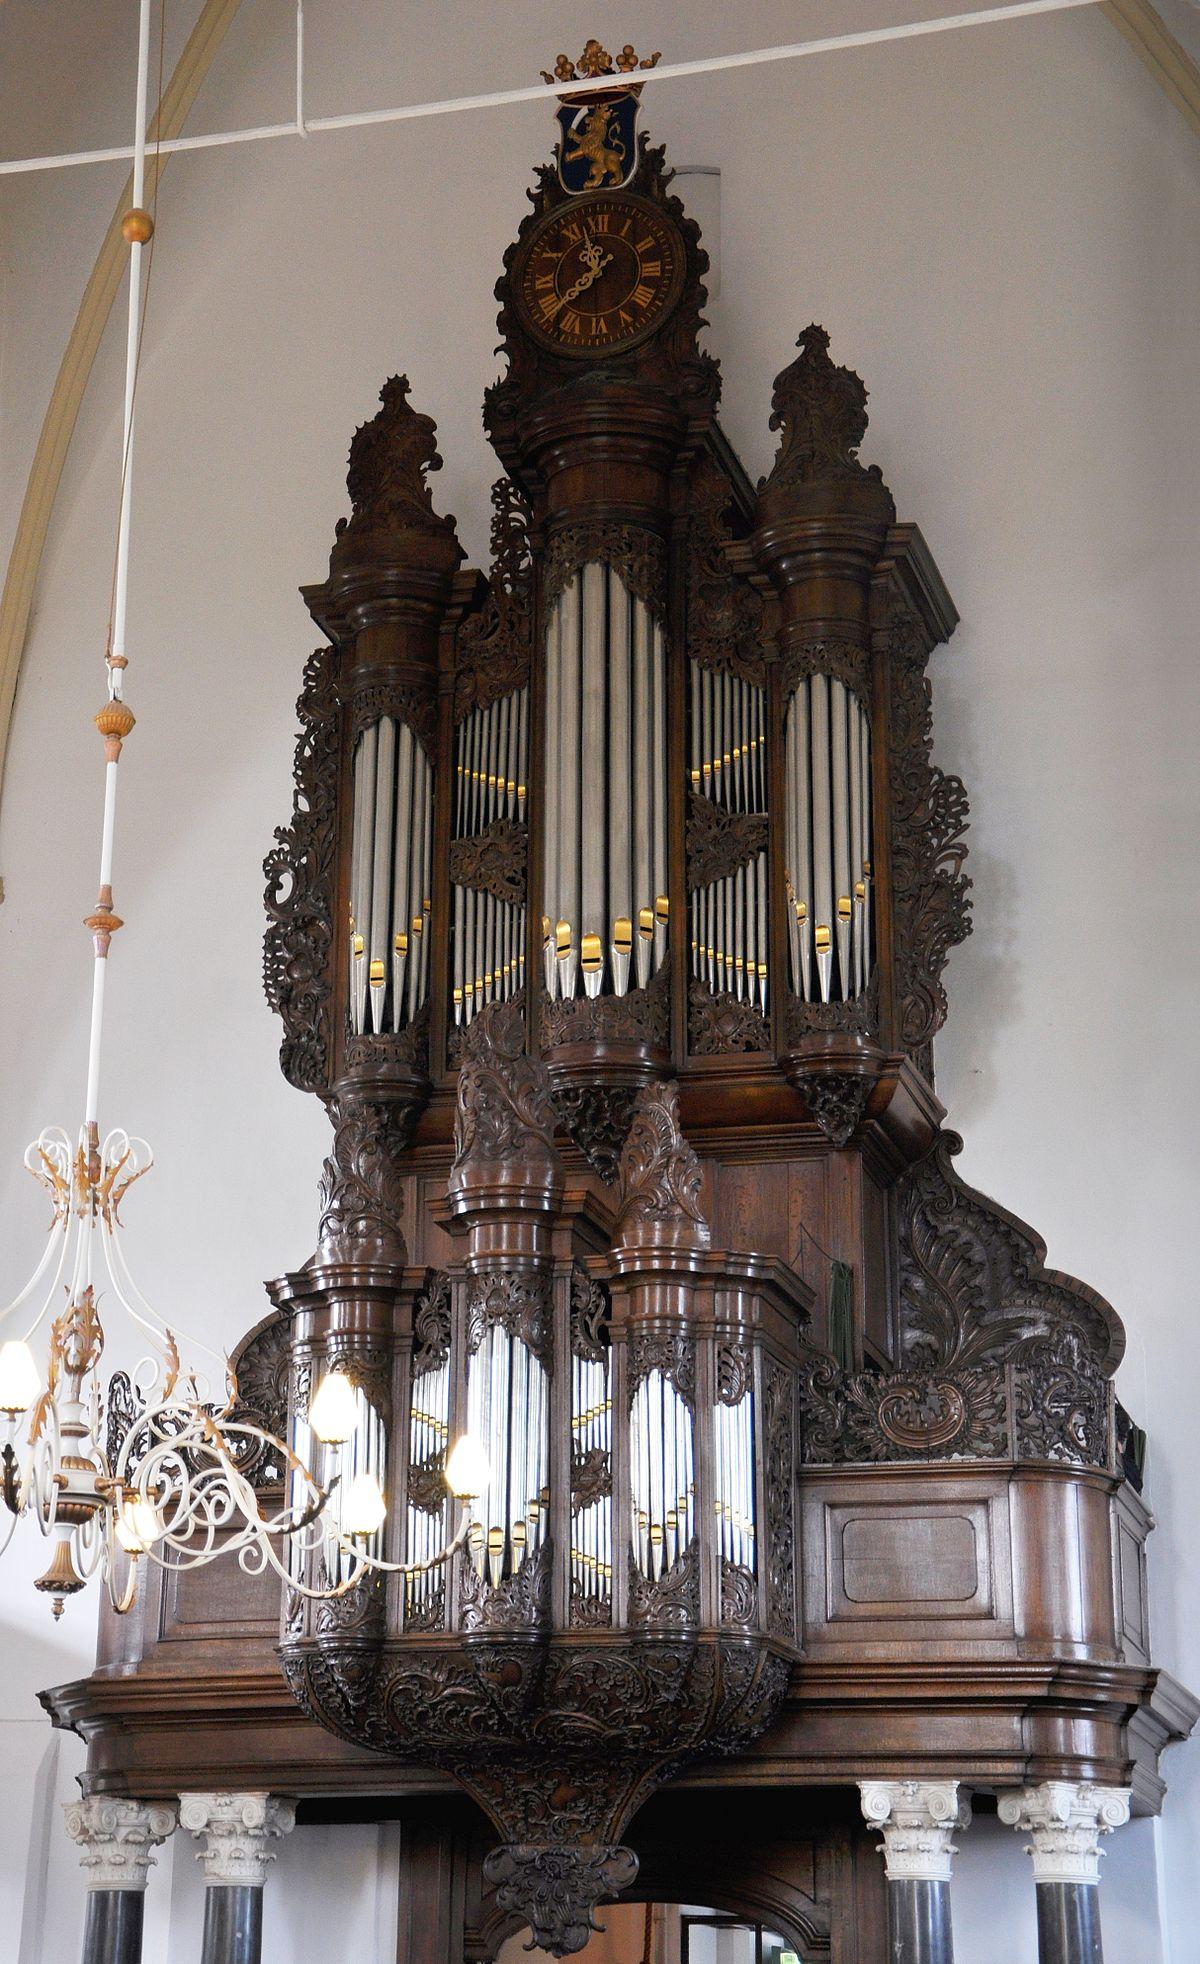 orgel van de grote kerk in nijkerk wikipedia. Black Bedroom Furniture Sets. Home Design Ideas